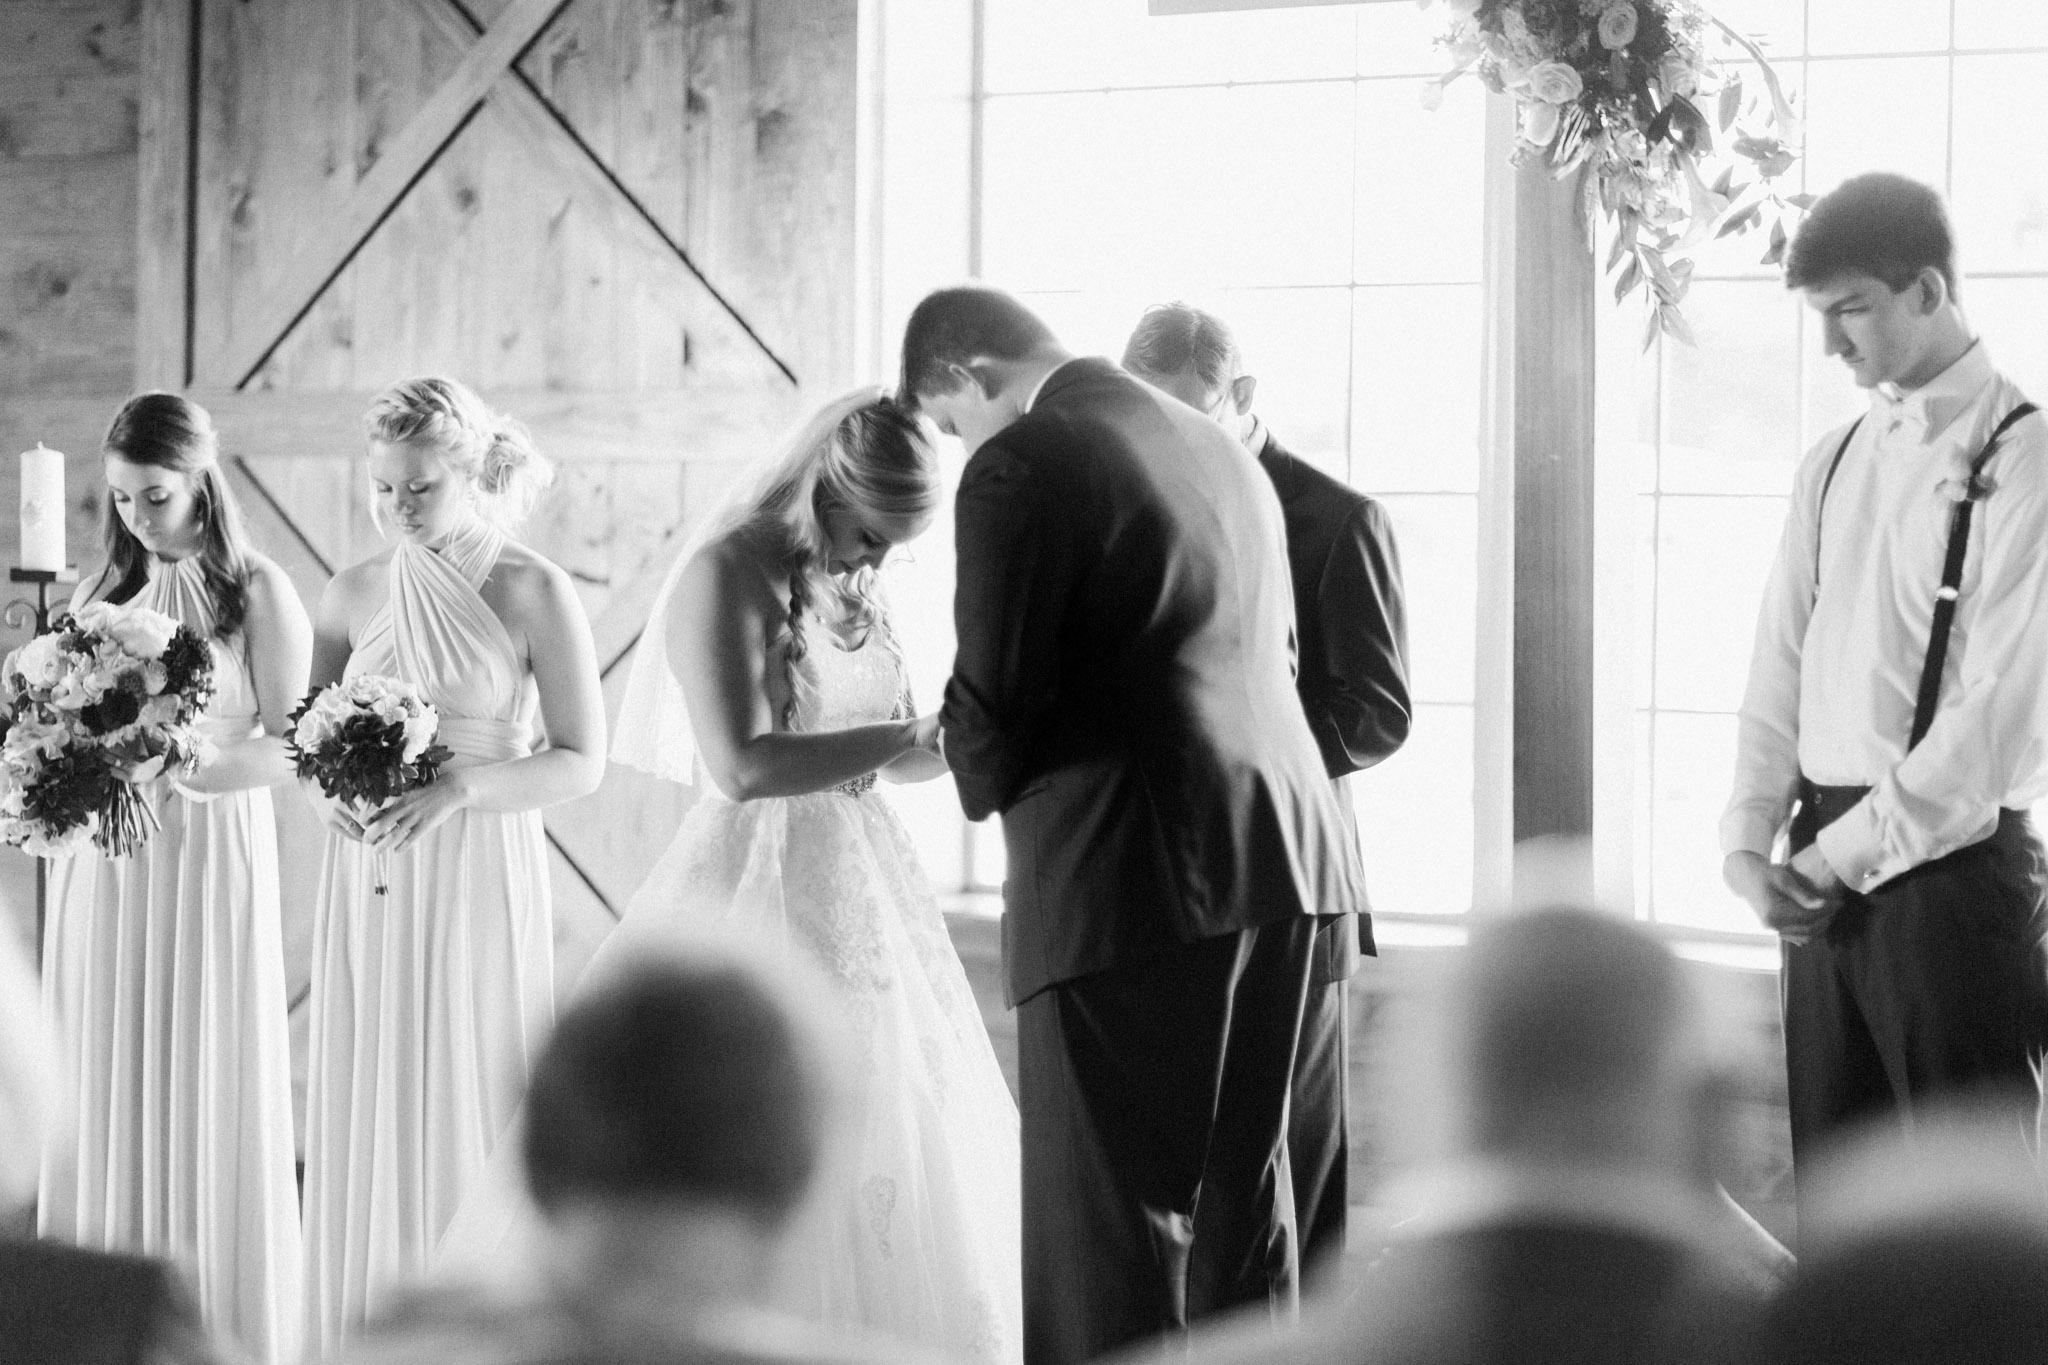 wichita-falls-wedding-photographer-43.jpg